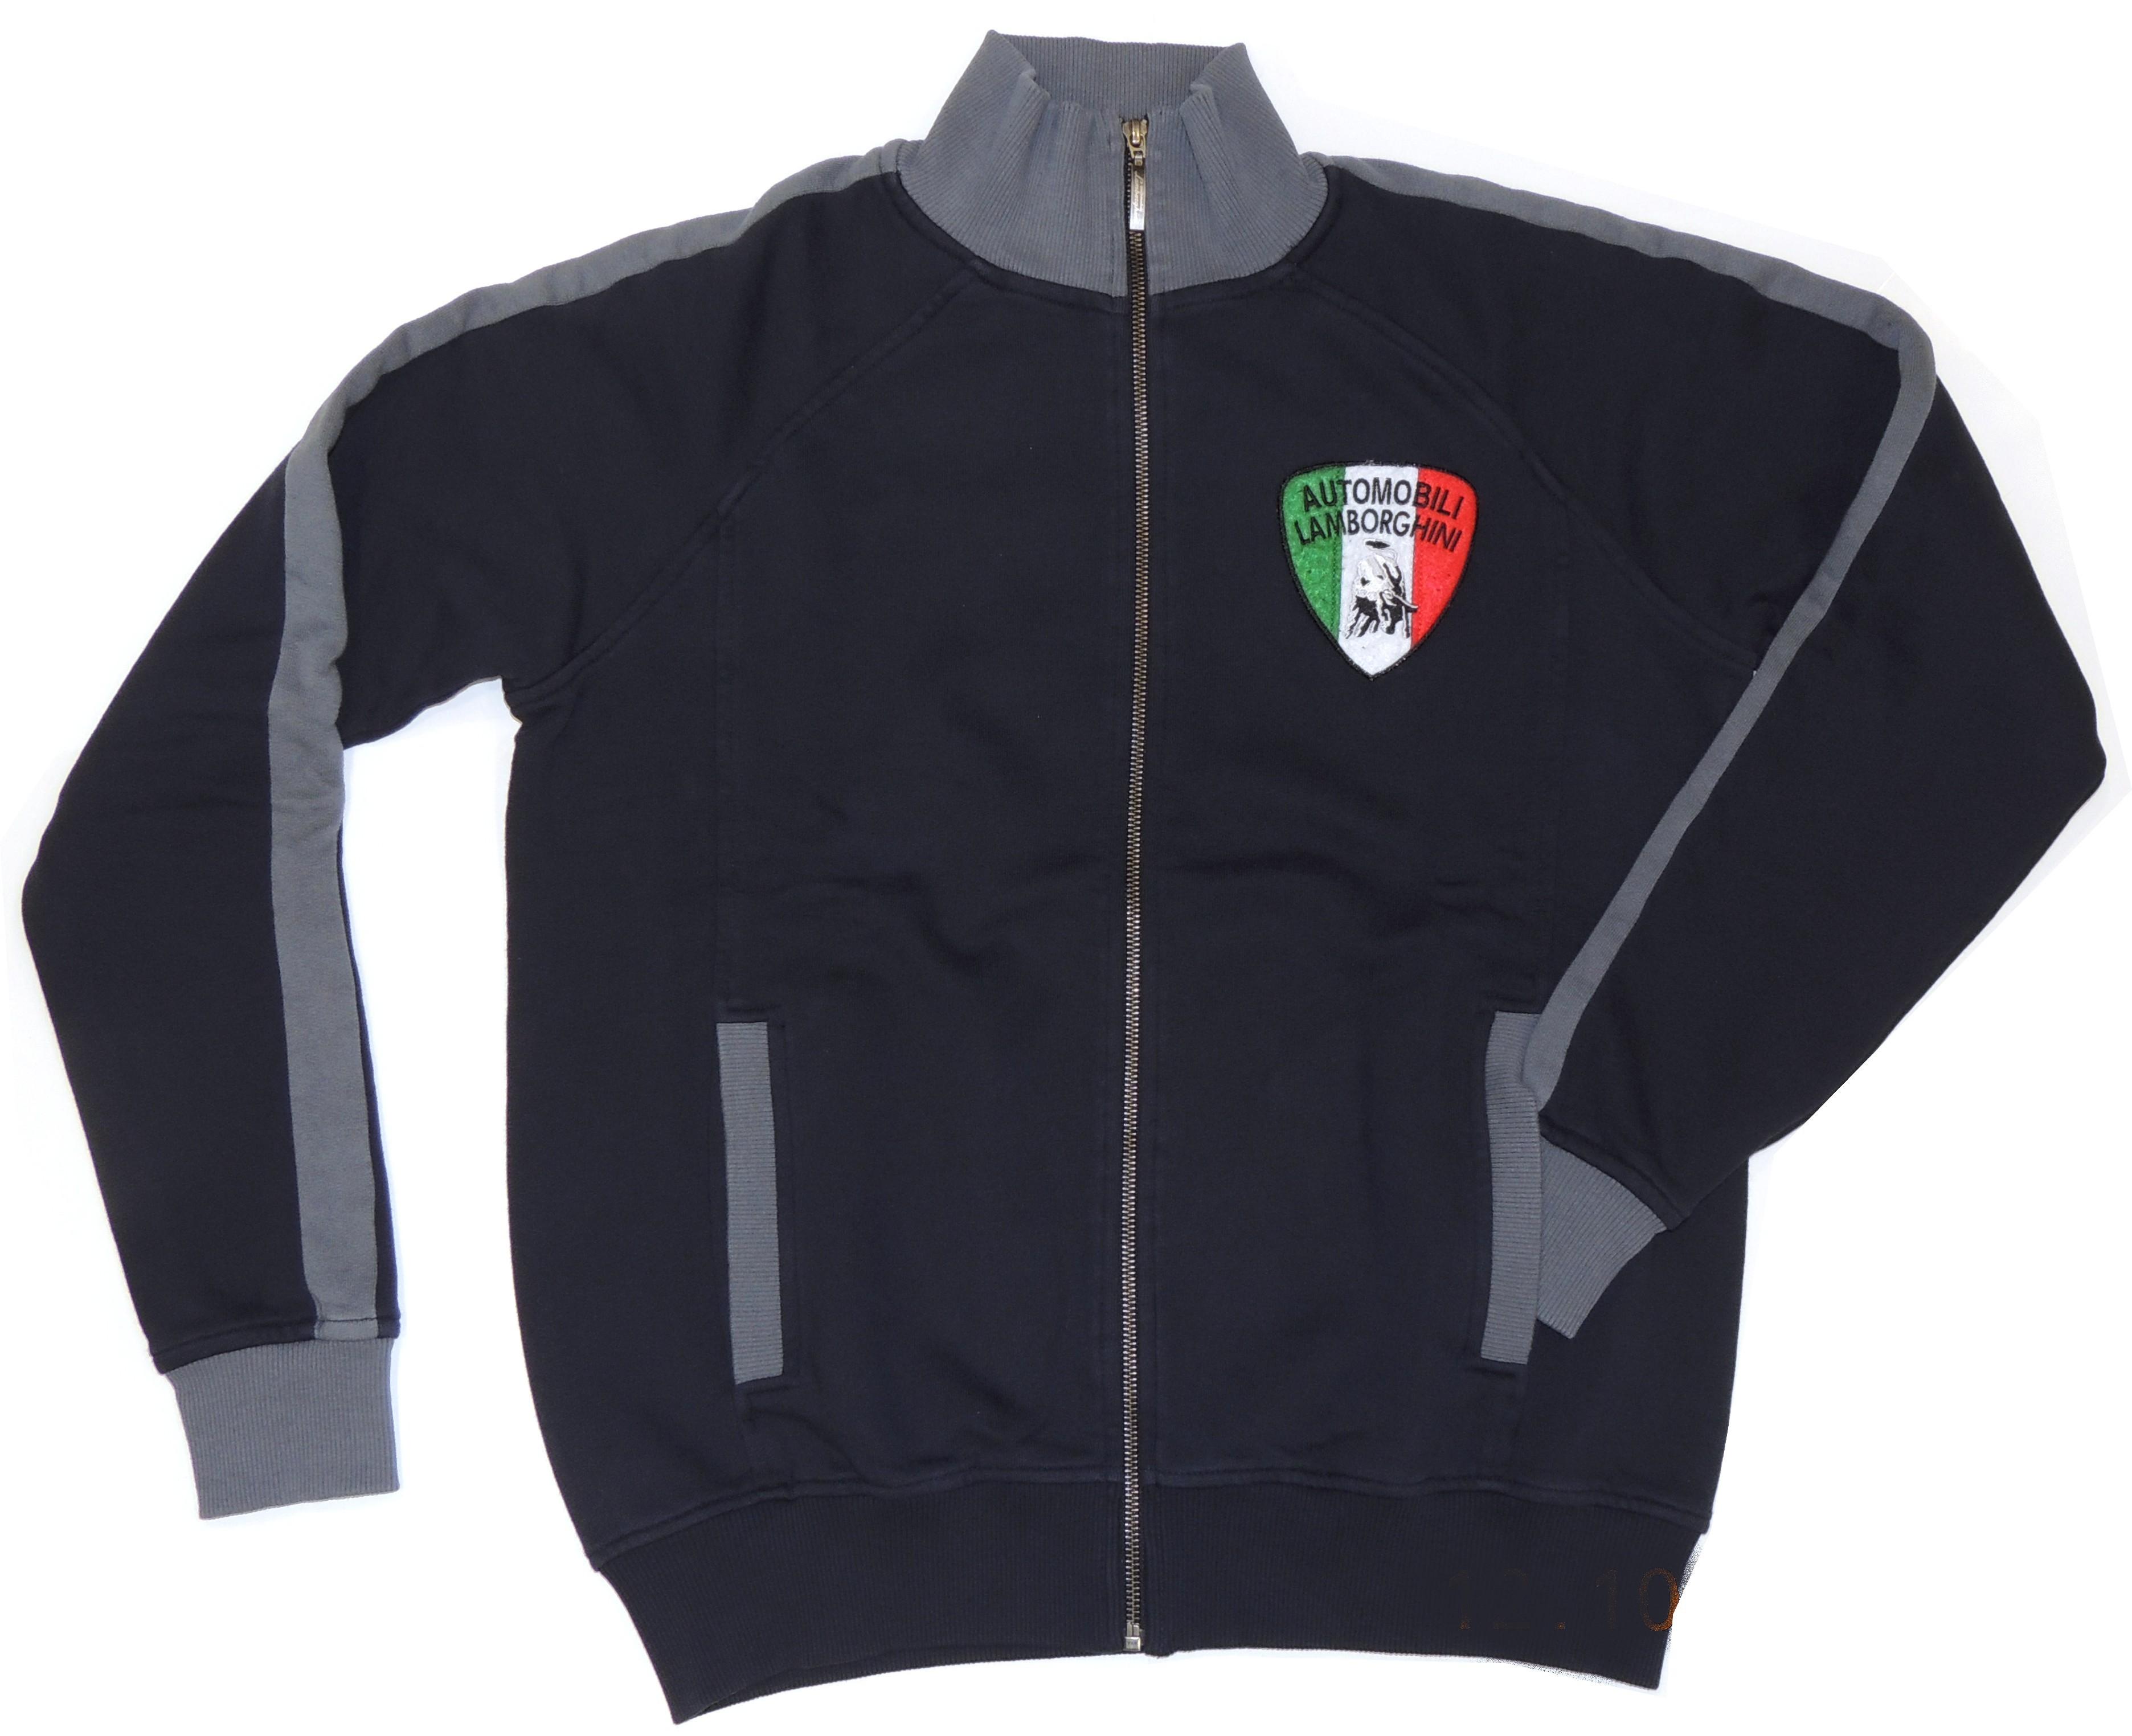 Lamborghini Men Sleeve Zip Up Sweatshirt Navy/Grey